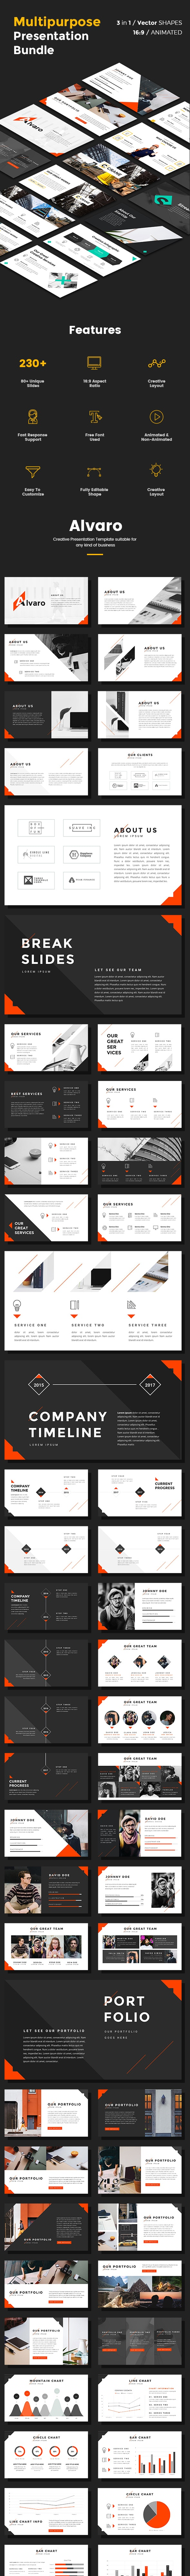 Multipurpose PowerPoint Bundle Vol 2 - Business PowerPoint Templates